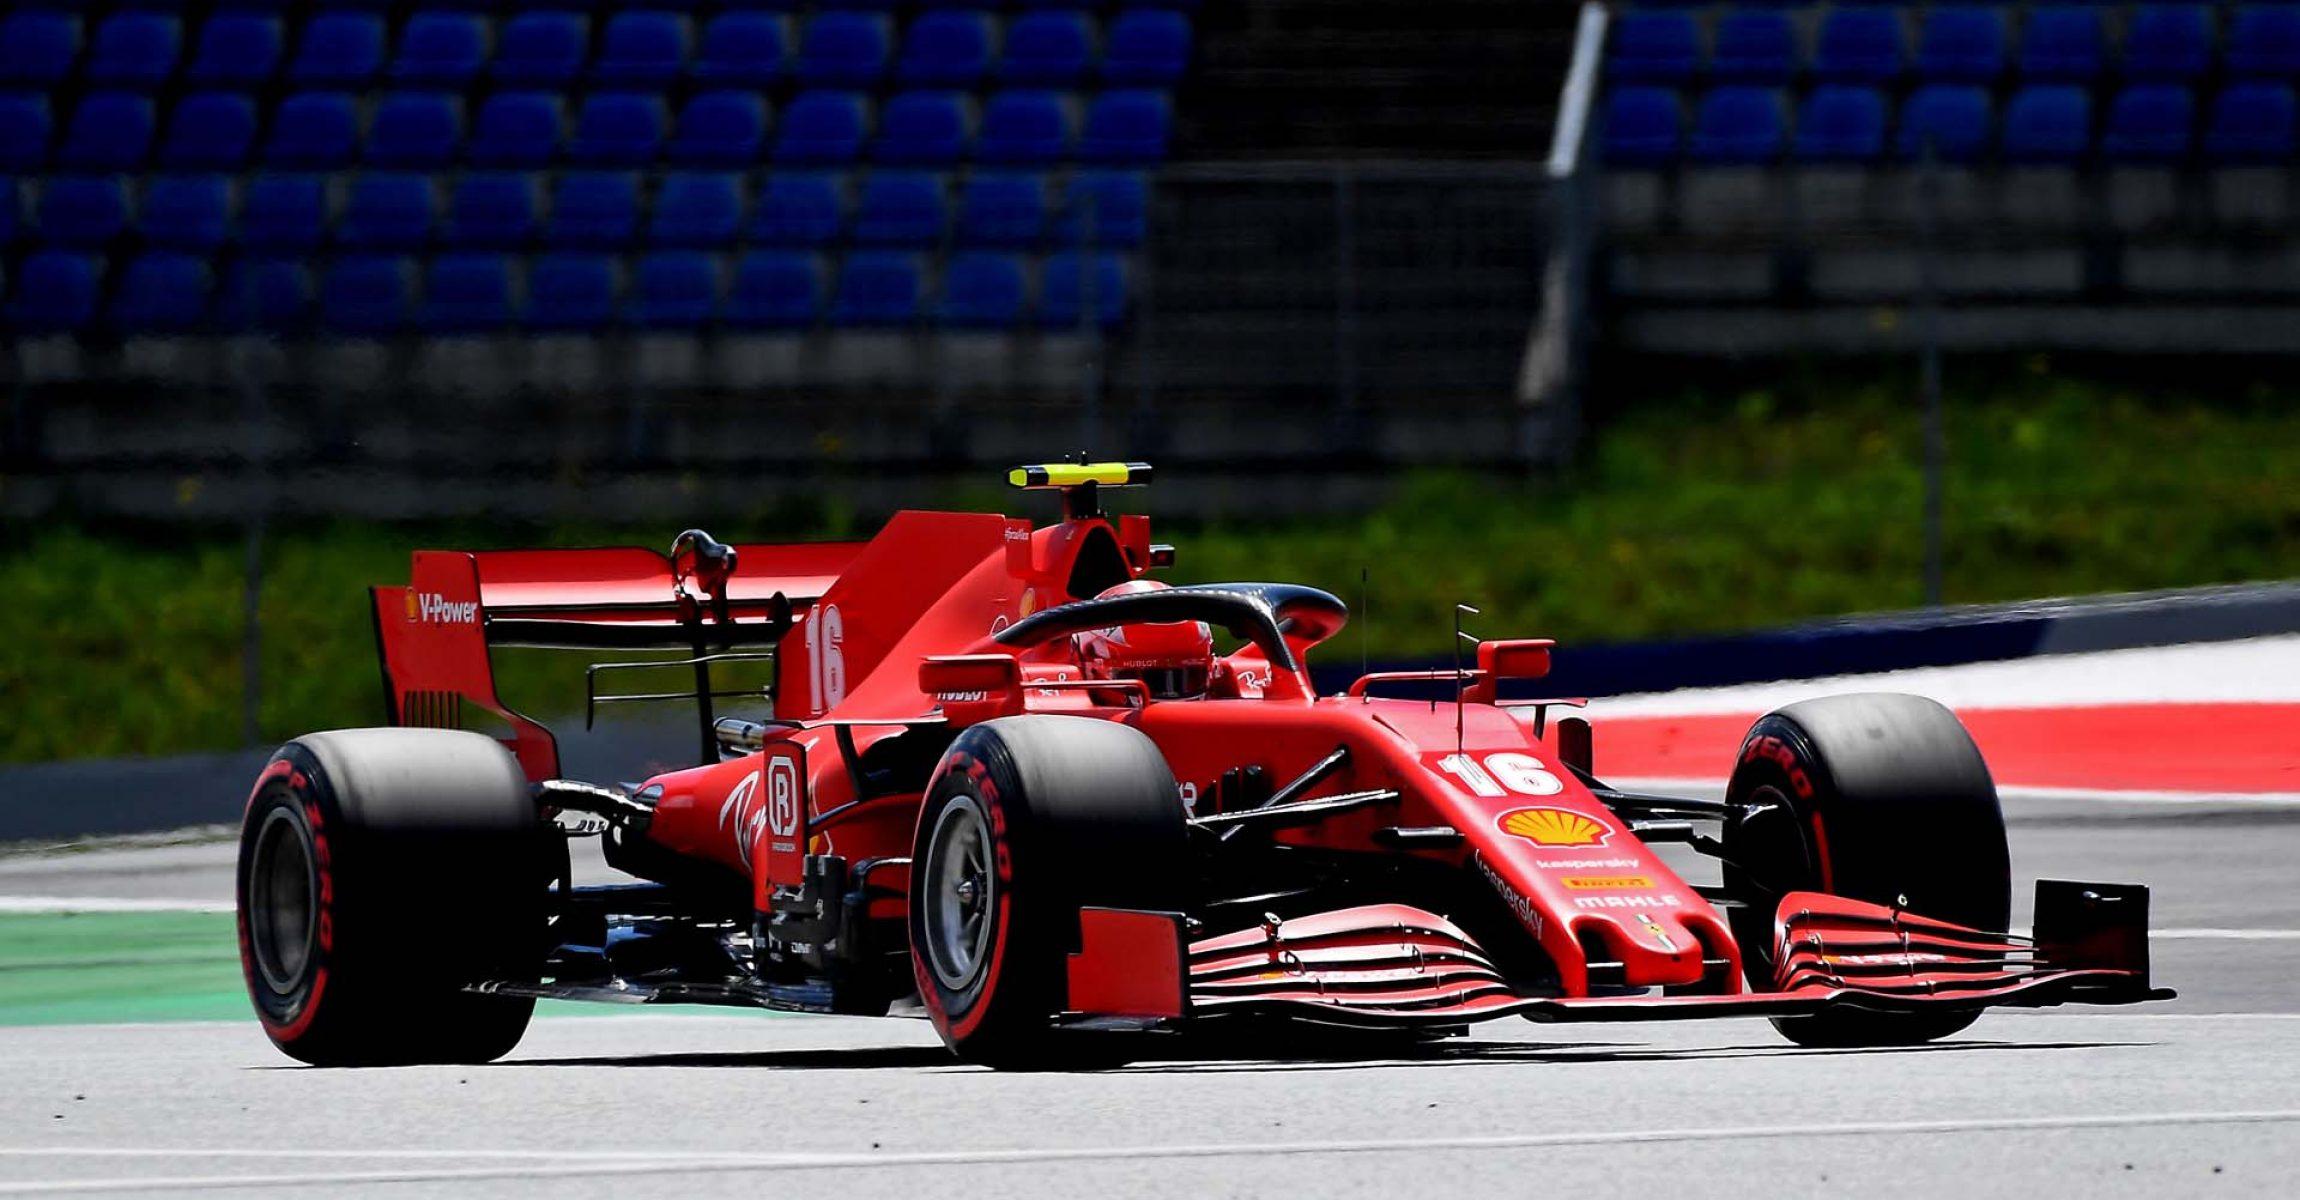 GP AUSTRIA F1/2020 -  SABATO 04/07/2020       credit: @Scuderia Ferrari Press Office Charles Leclerc